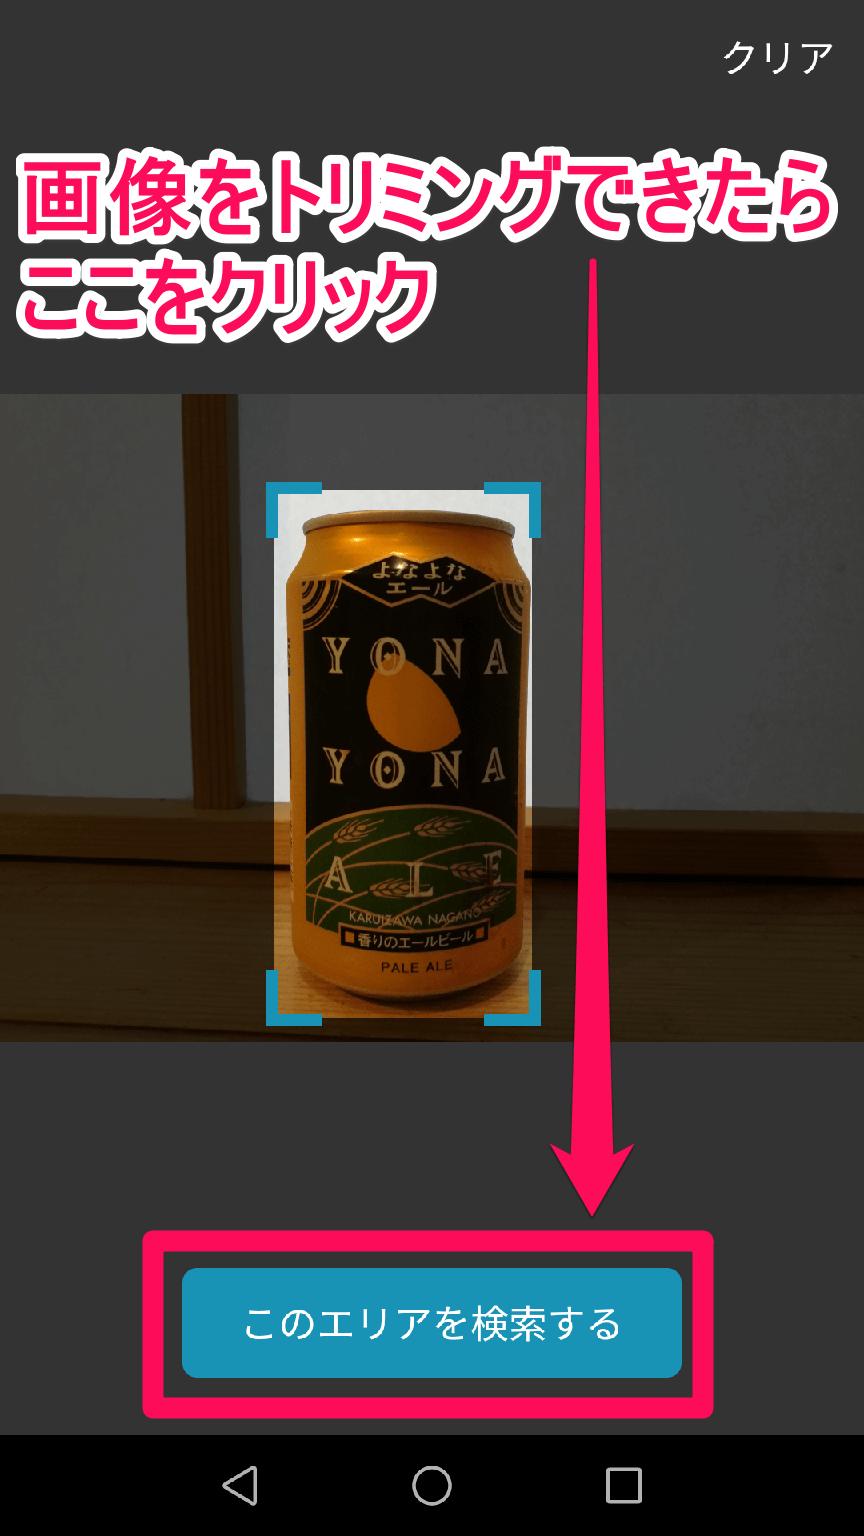 Android版(アンドロイド版)の「Bing」(ビング)アプリの画像検索で画面のトリミング位置が決まった画面